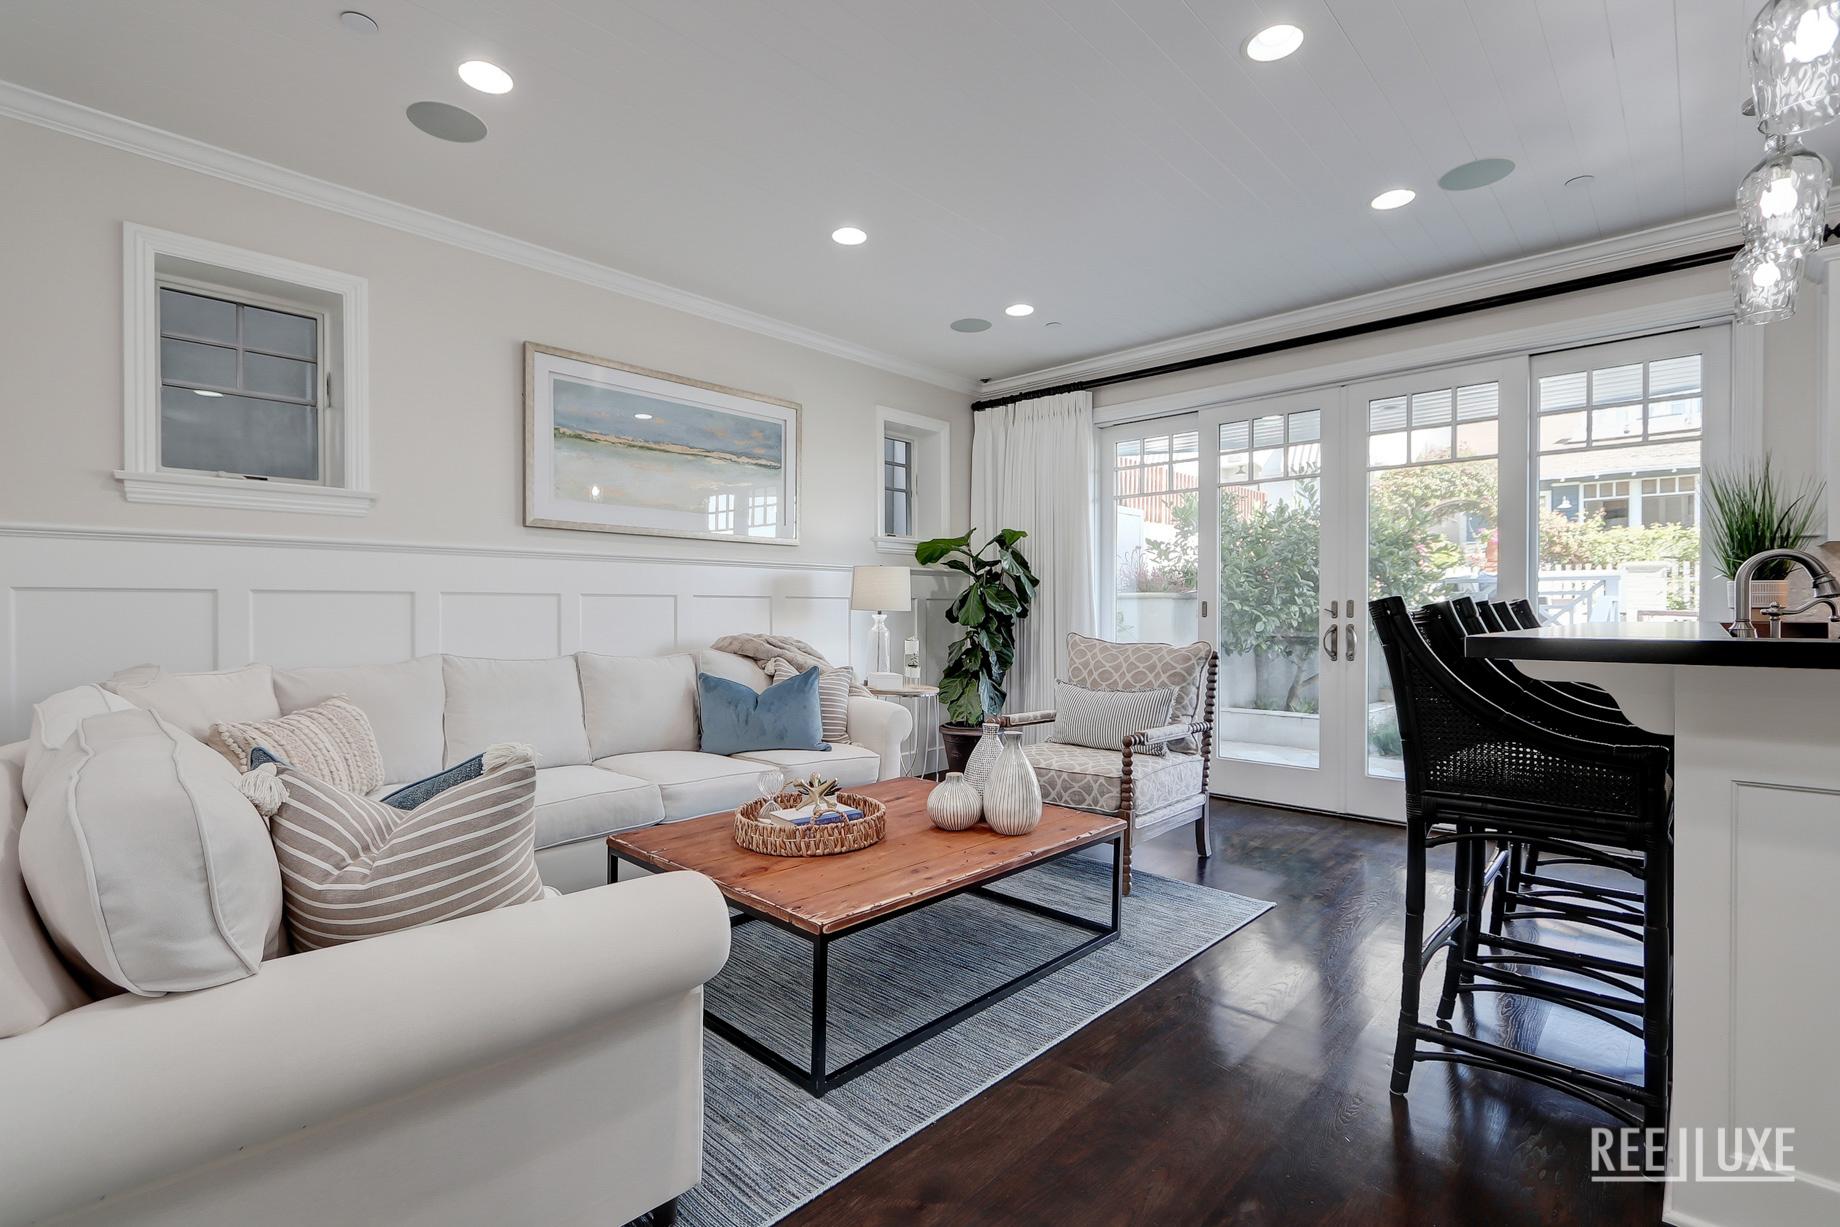 Coastal Oceanview Luxury Retreat - 125 8th St, Manhattan Beach, CA, USA - Family Room